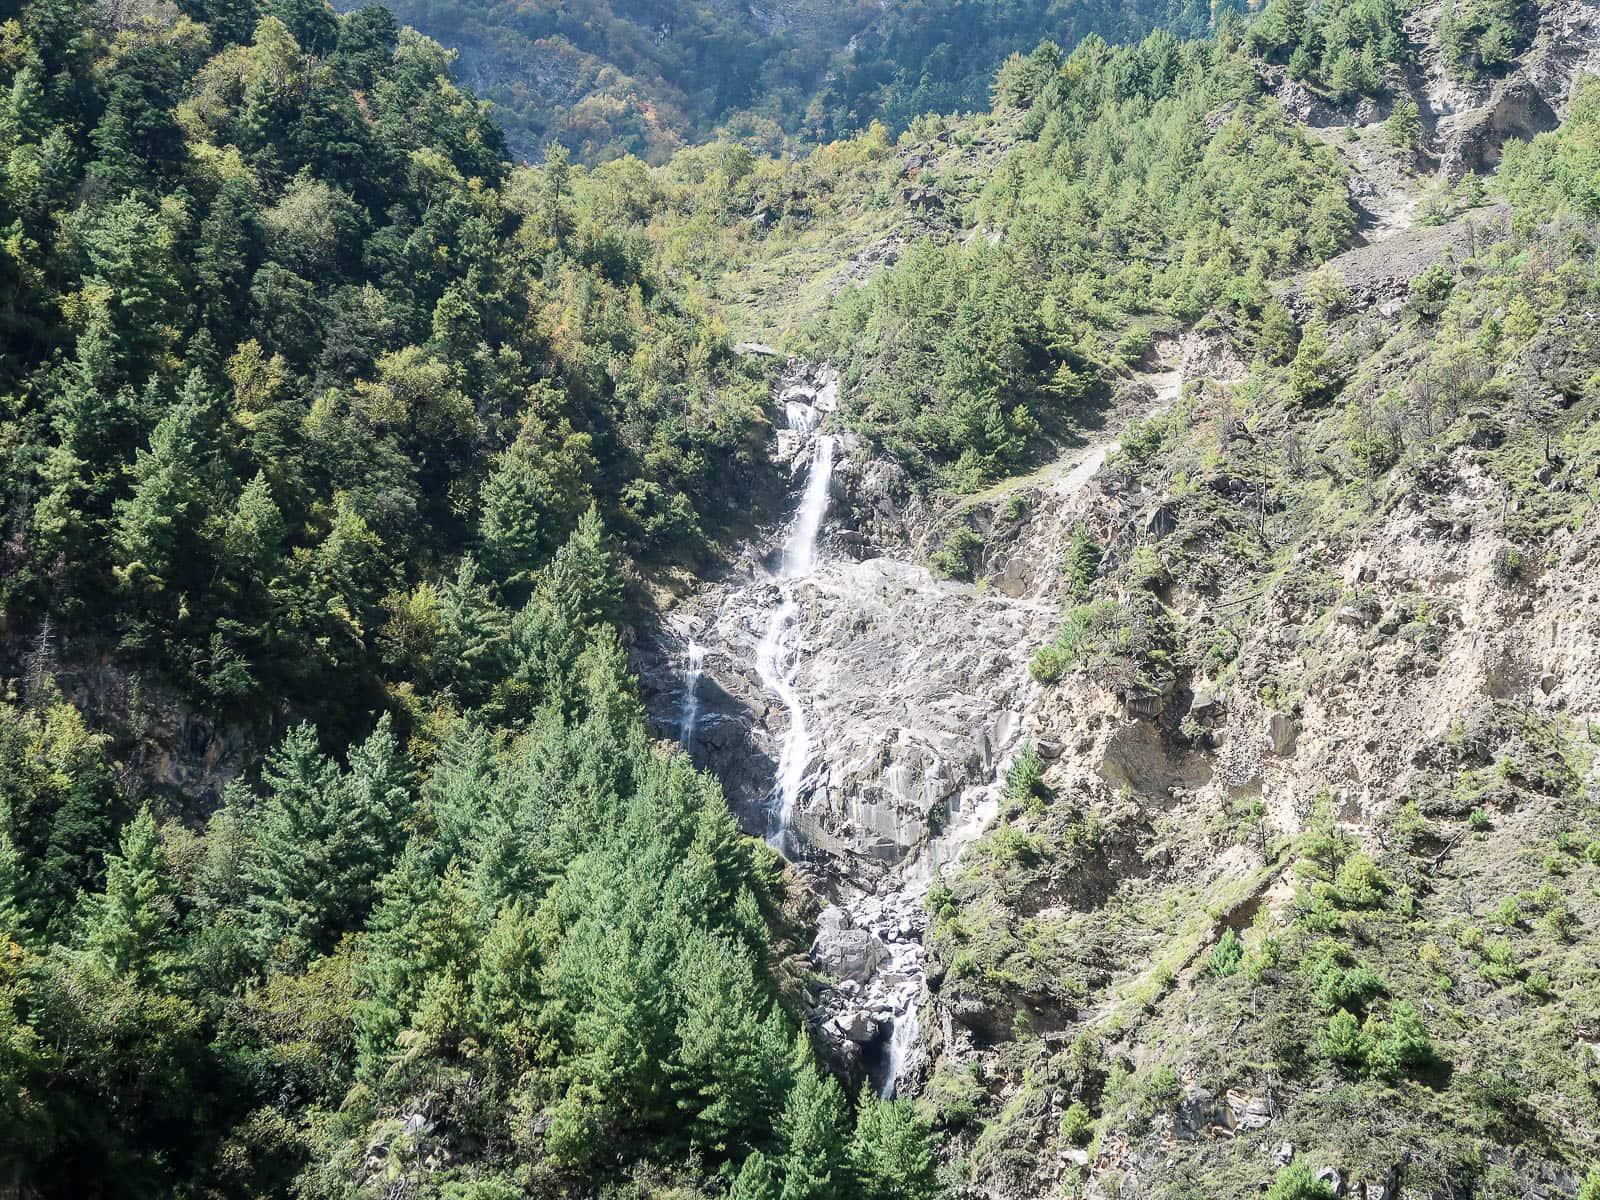 Wodospad Nepal Annapurna Circuit